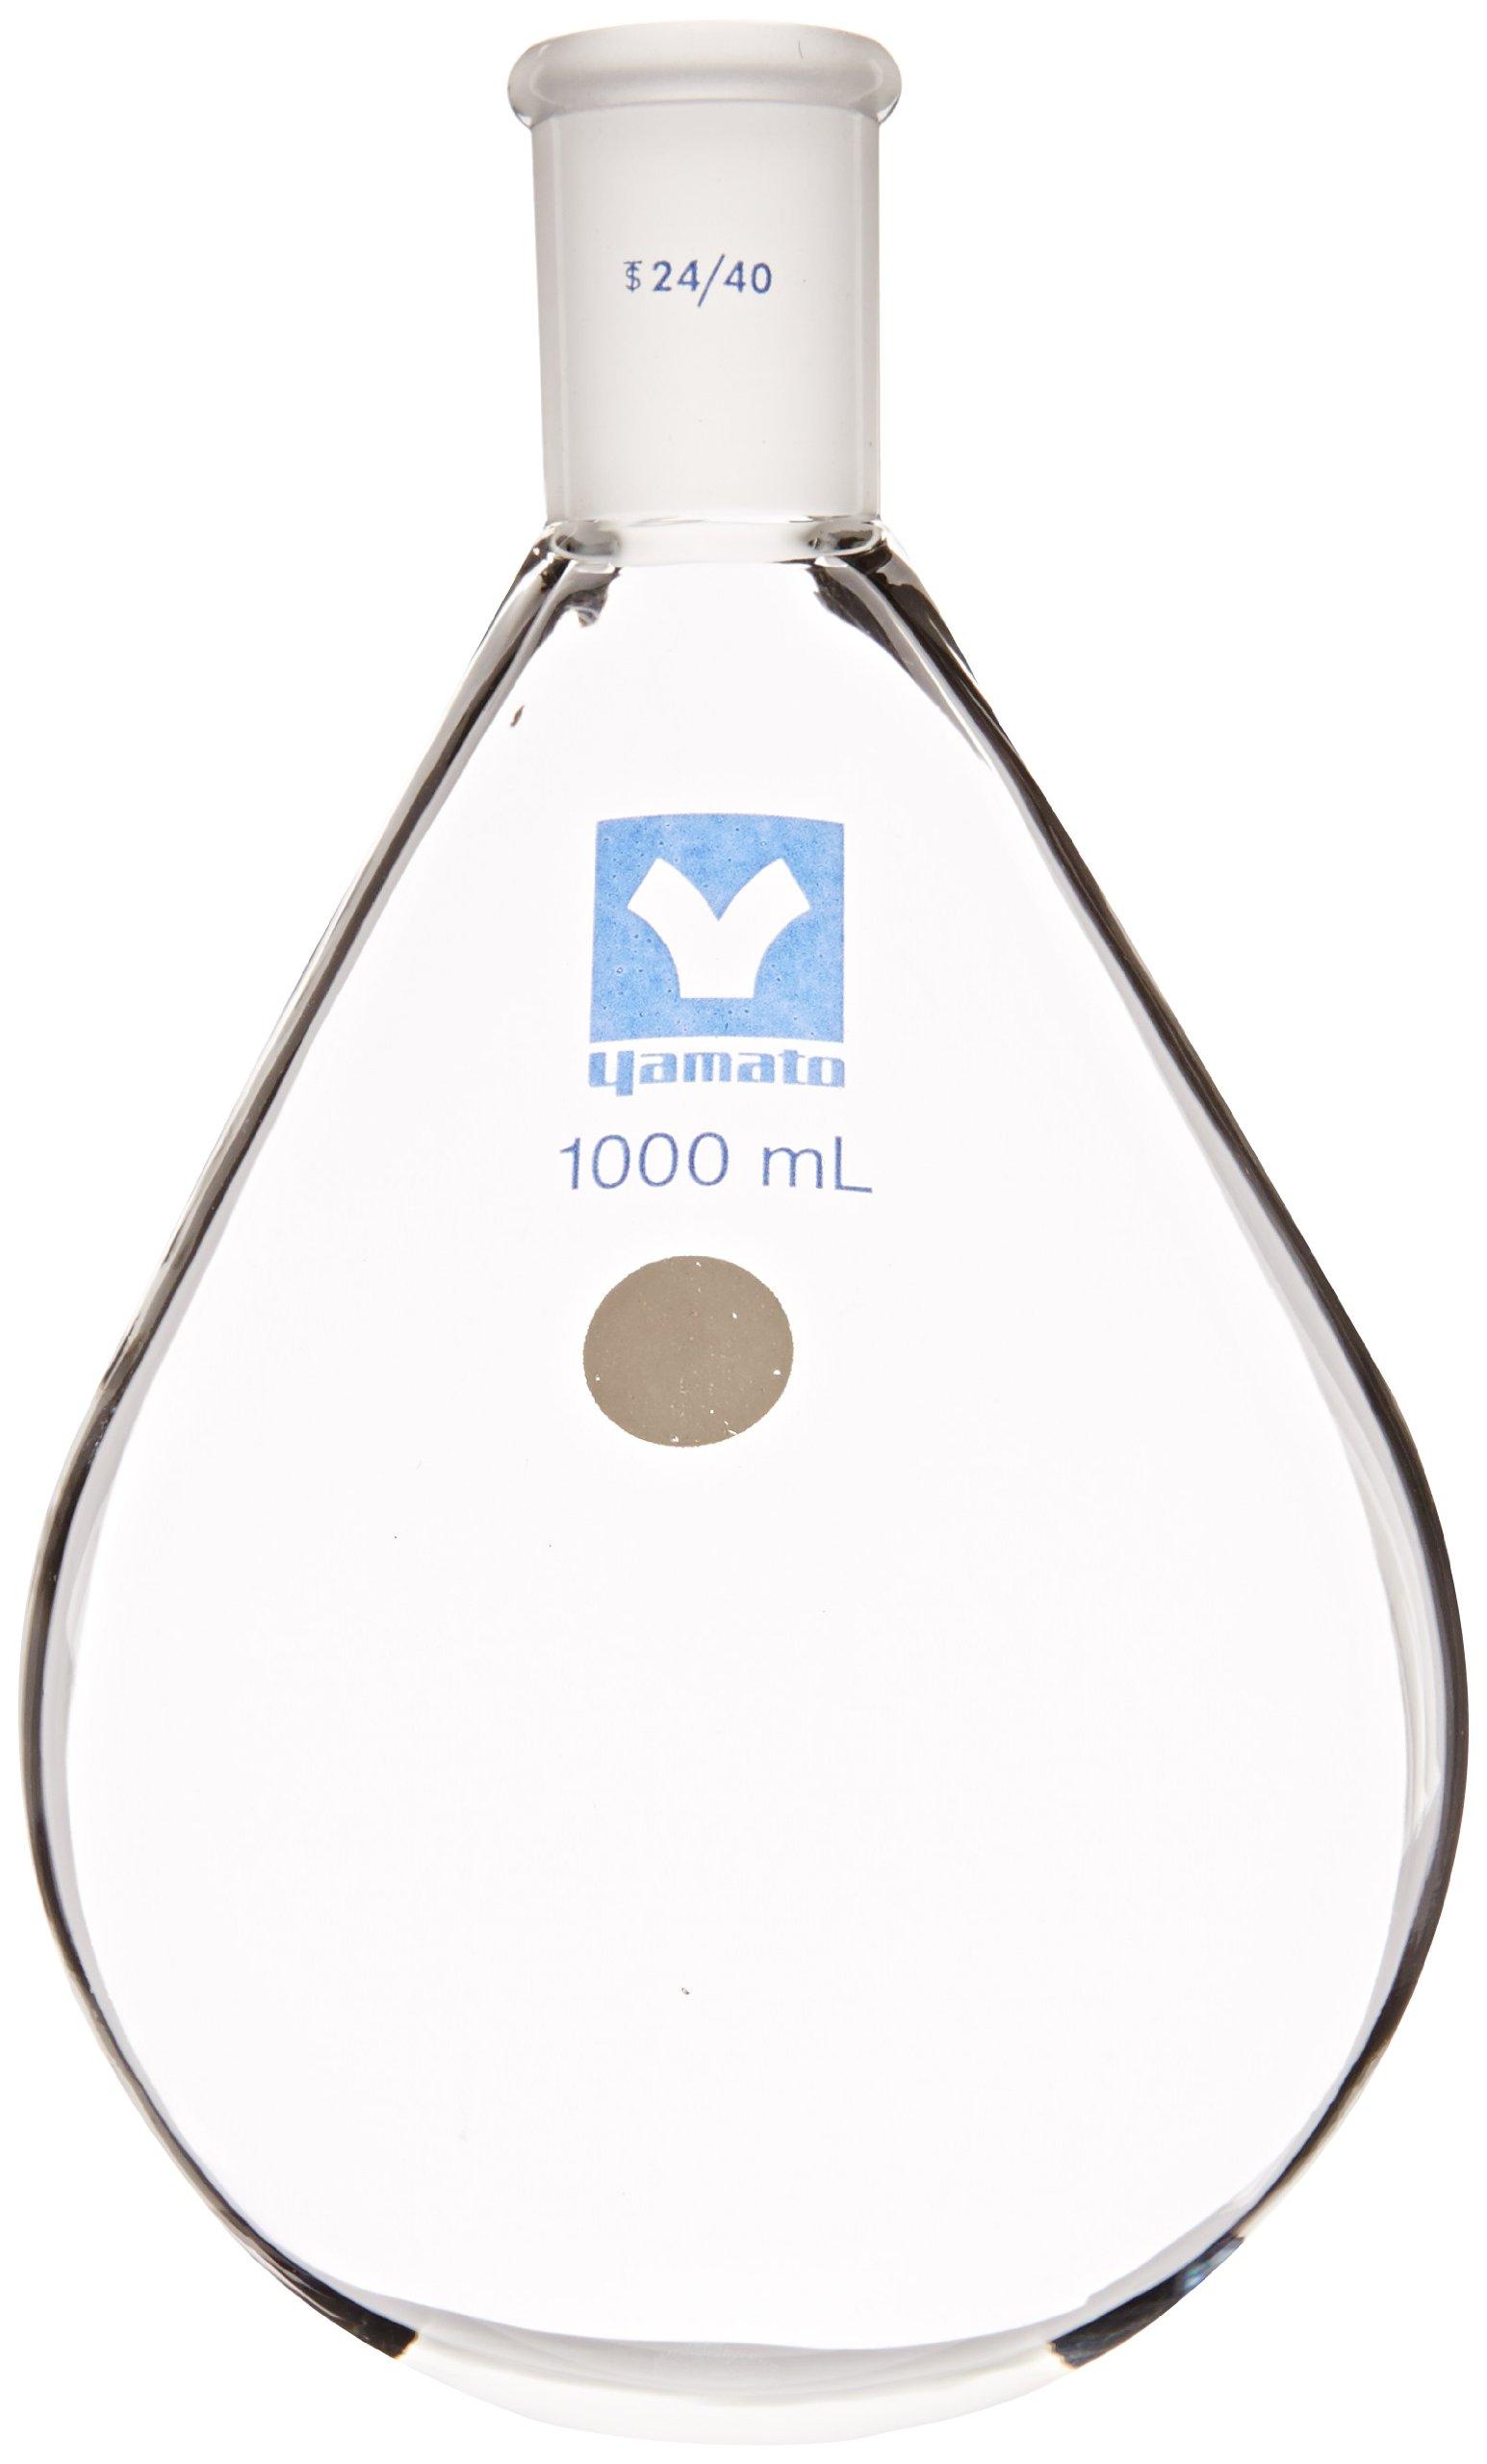 Yamato Scientific America RE-47-411 Evaporating Flask for Re-200 Rotary Evaporator, 1L Capacity